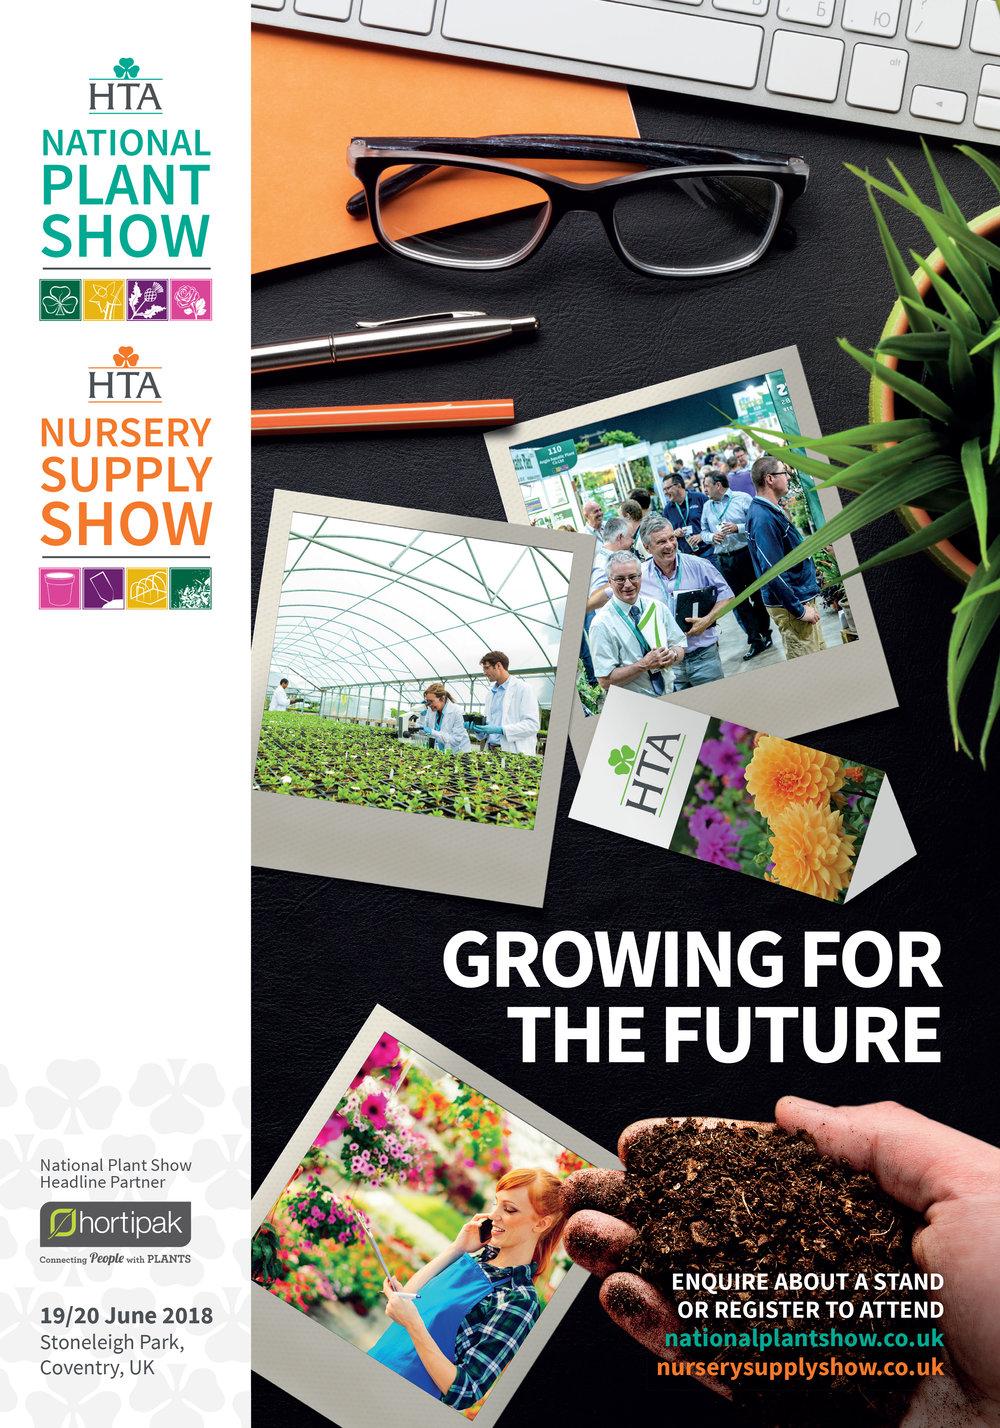 HTA-15233-NPS-NSS-Combined-2018-Advert---Garden-and-Hardware.jpg